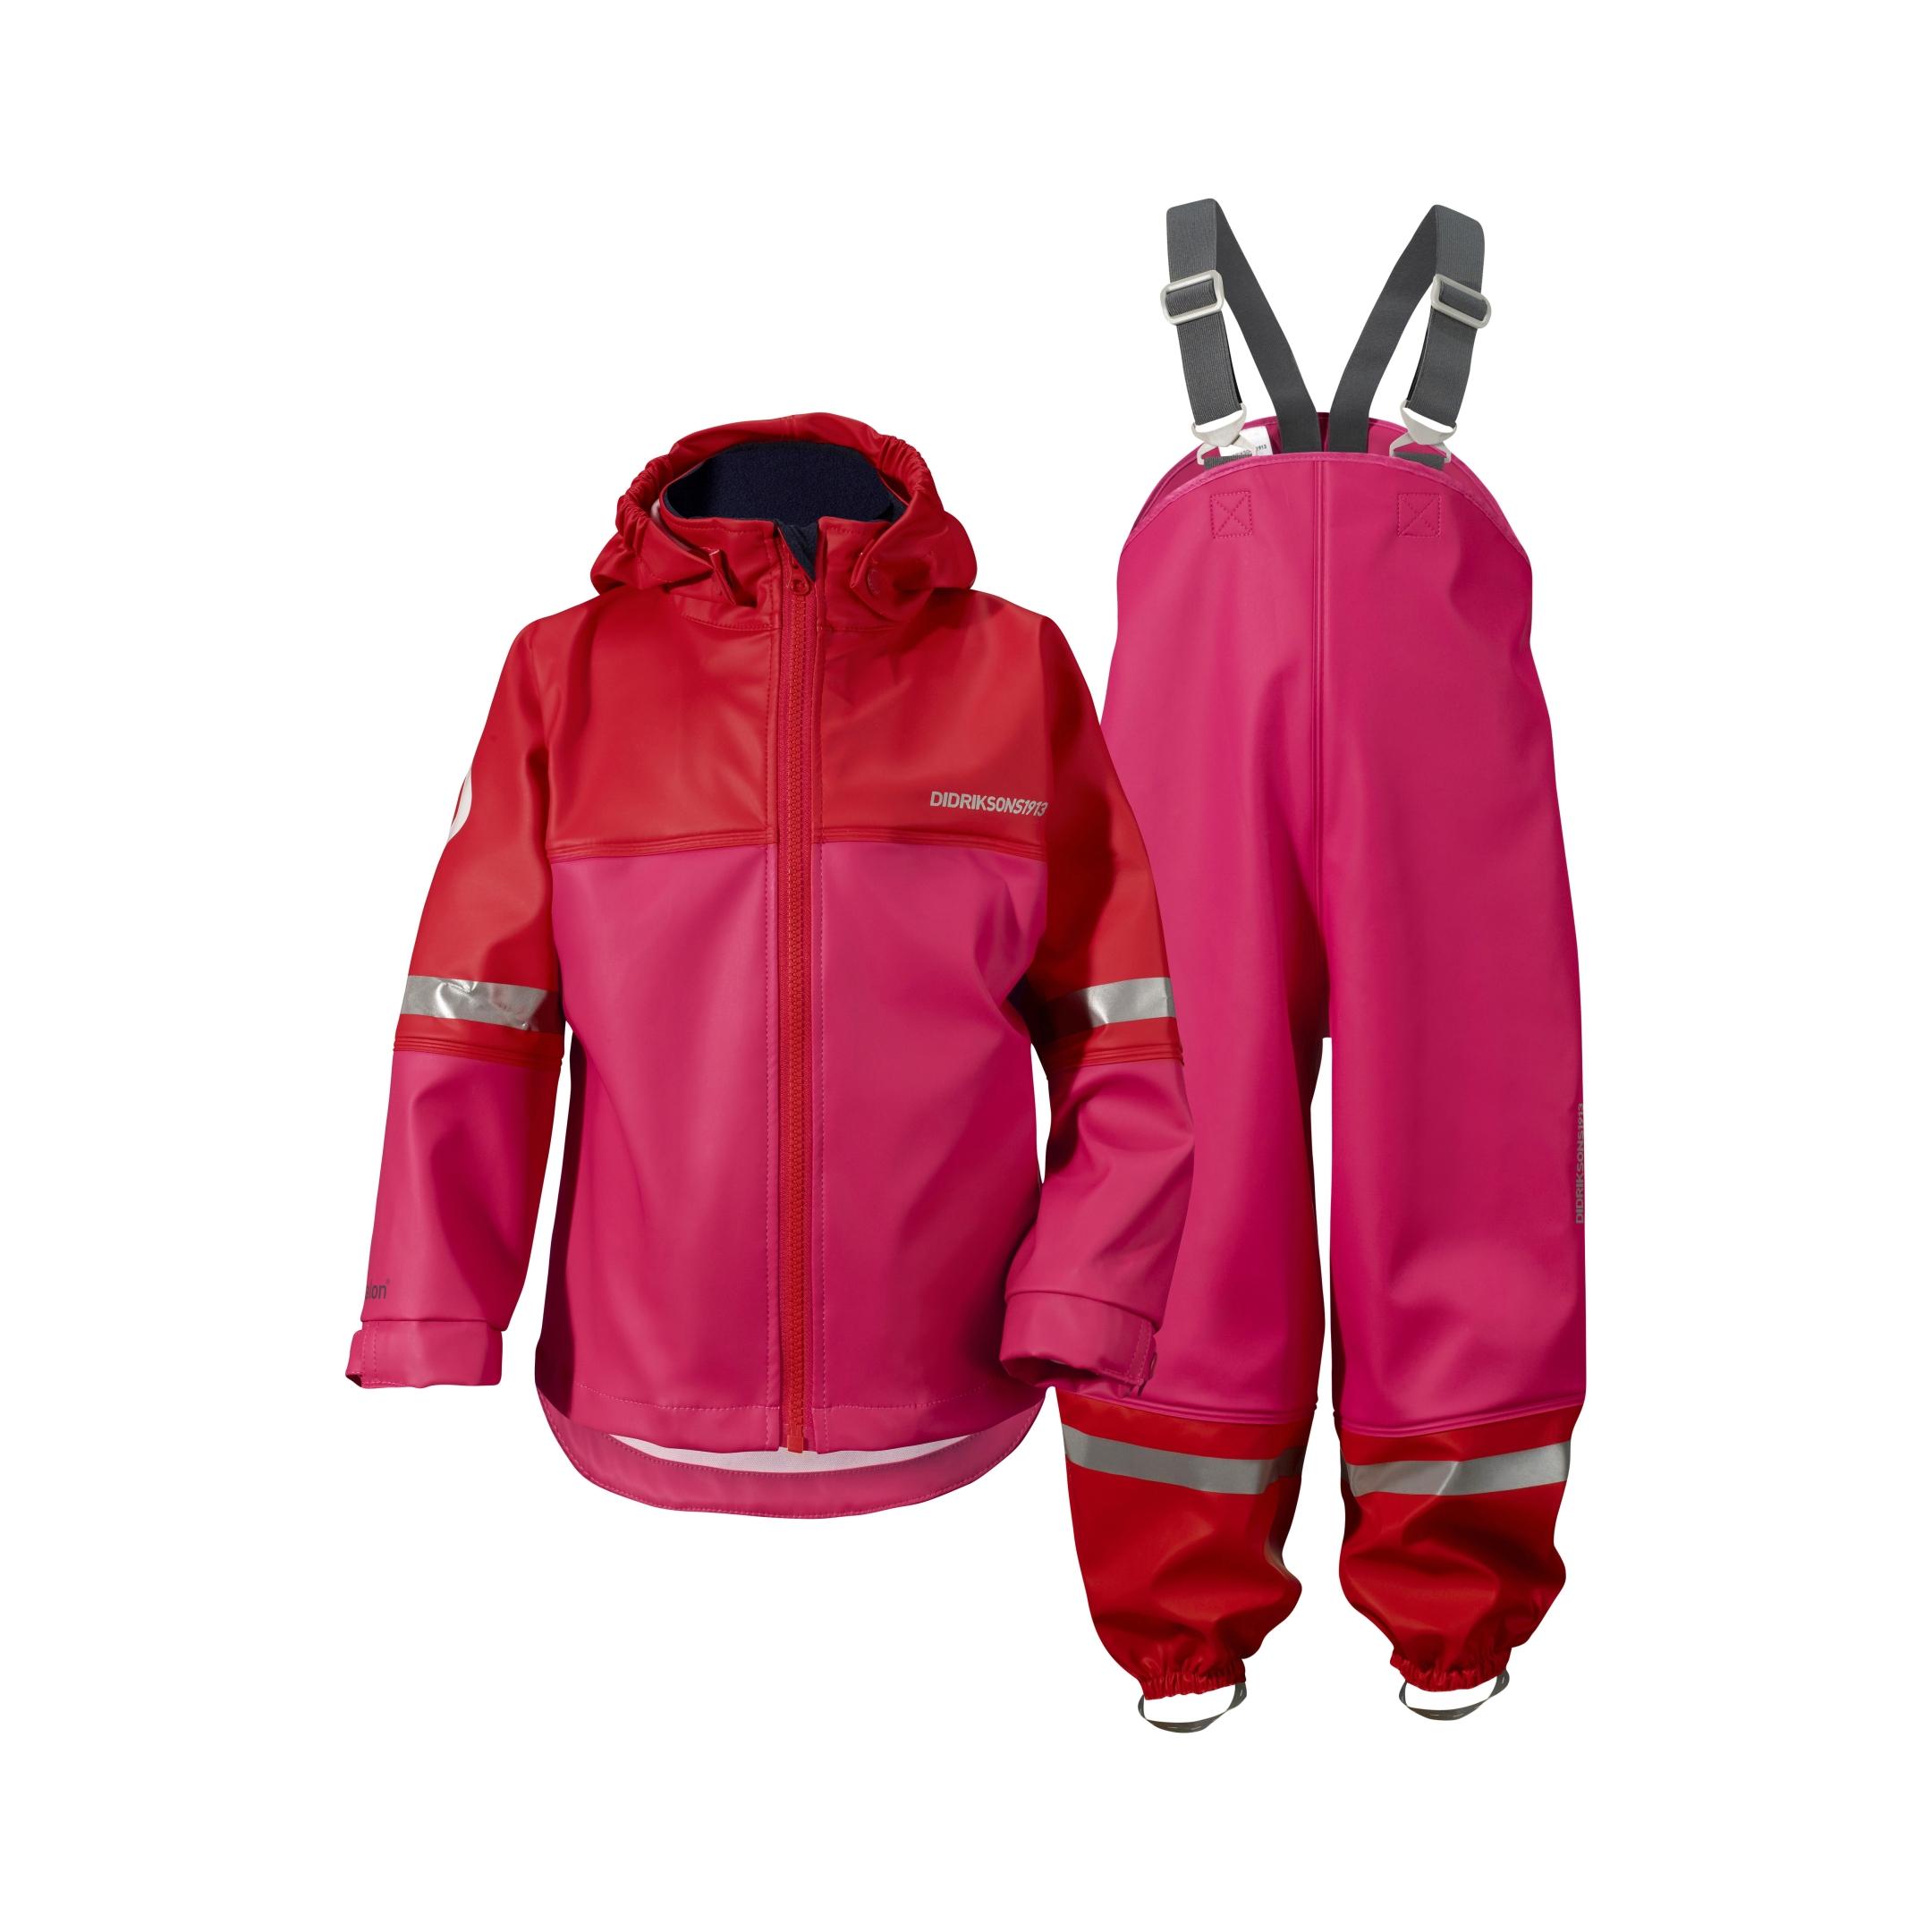 Дидриксон детский костюм дождевой WATERMAN + средство для стирки, - фото 11